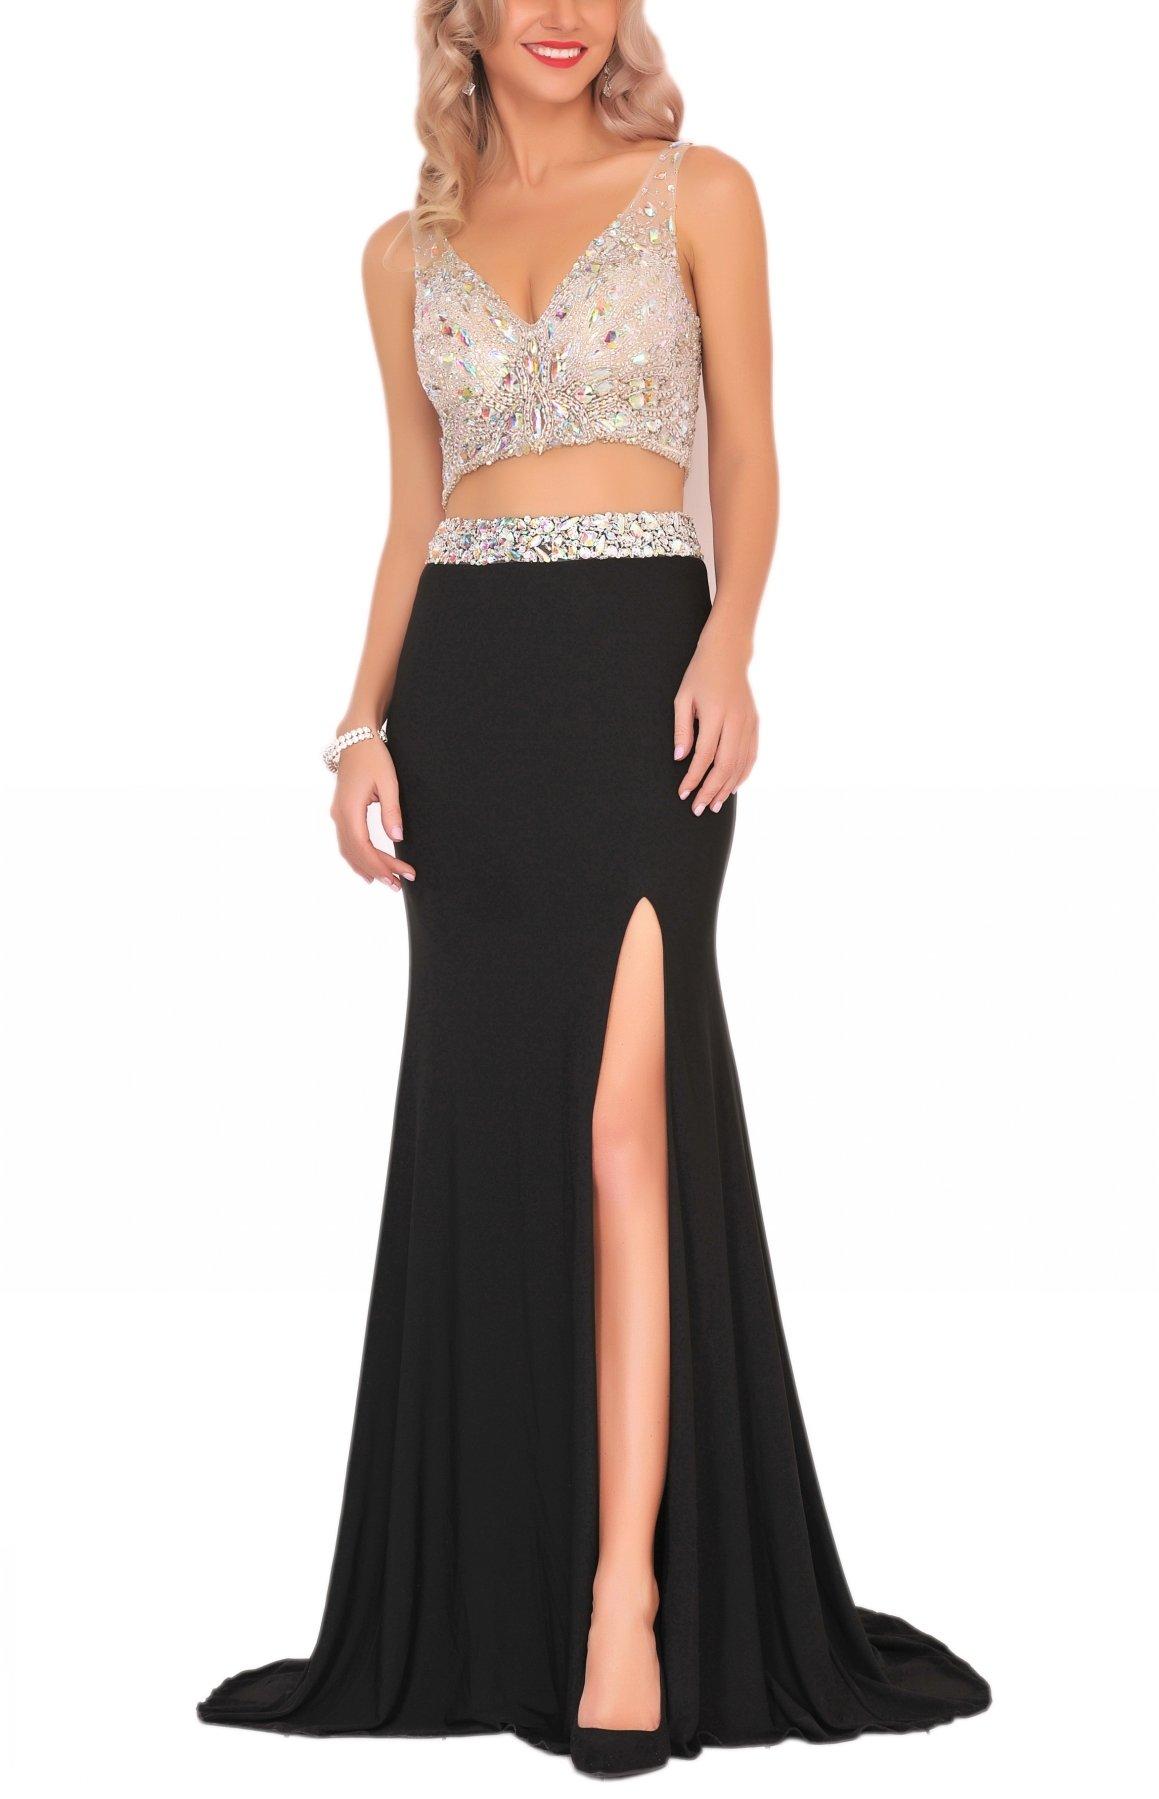 Two Piece Dresses Prom: Amazon.com